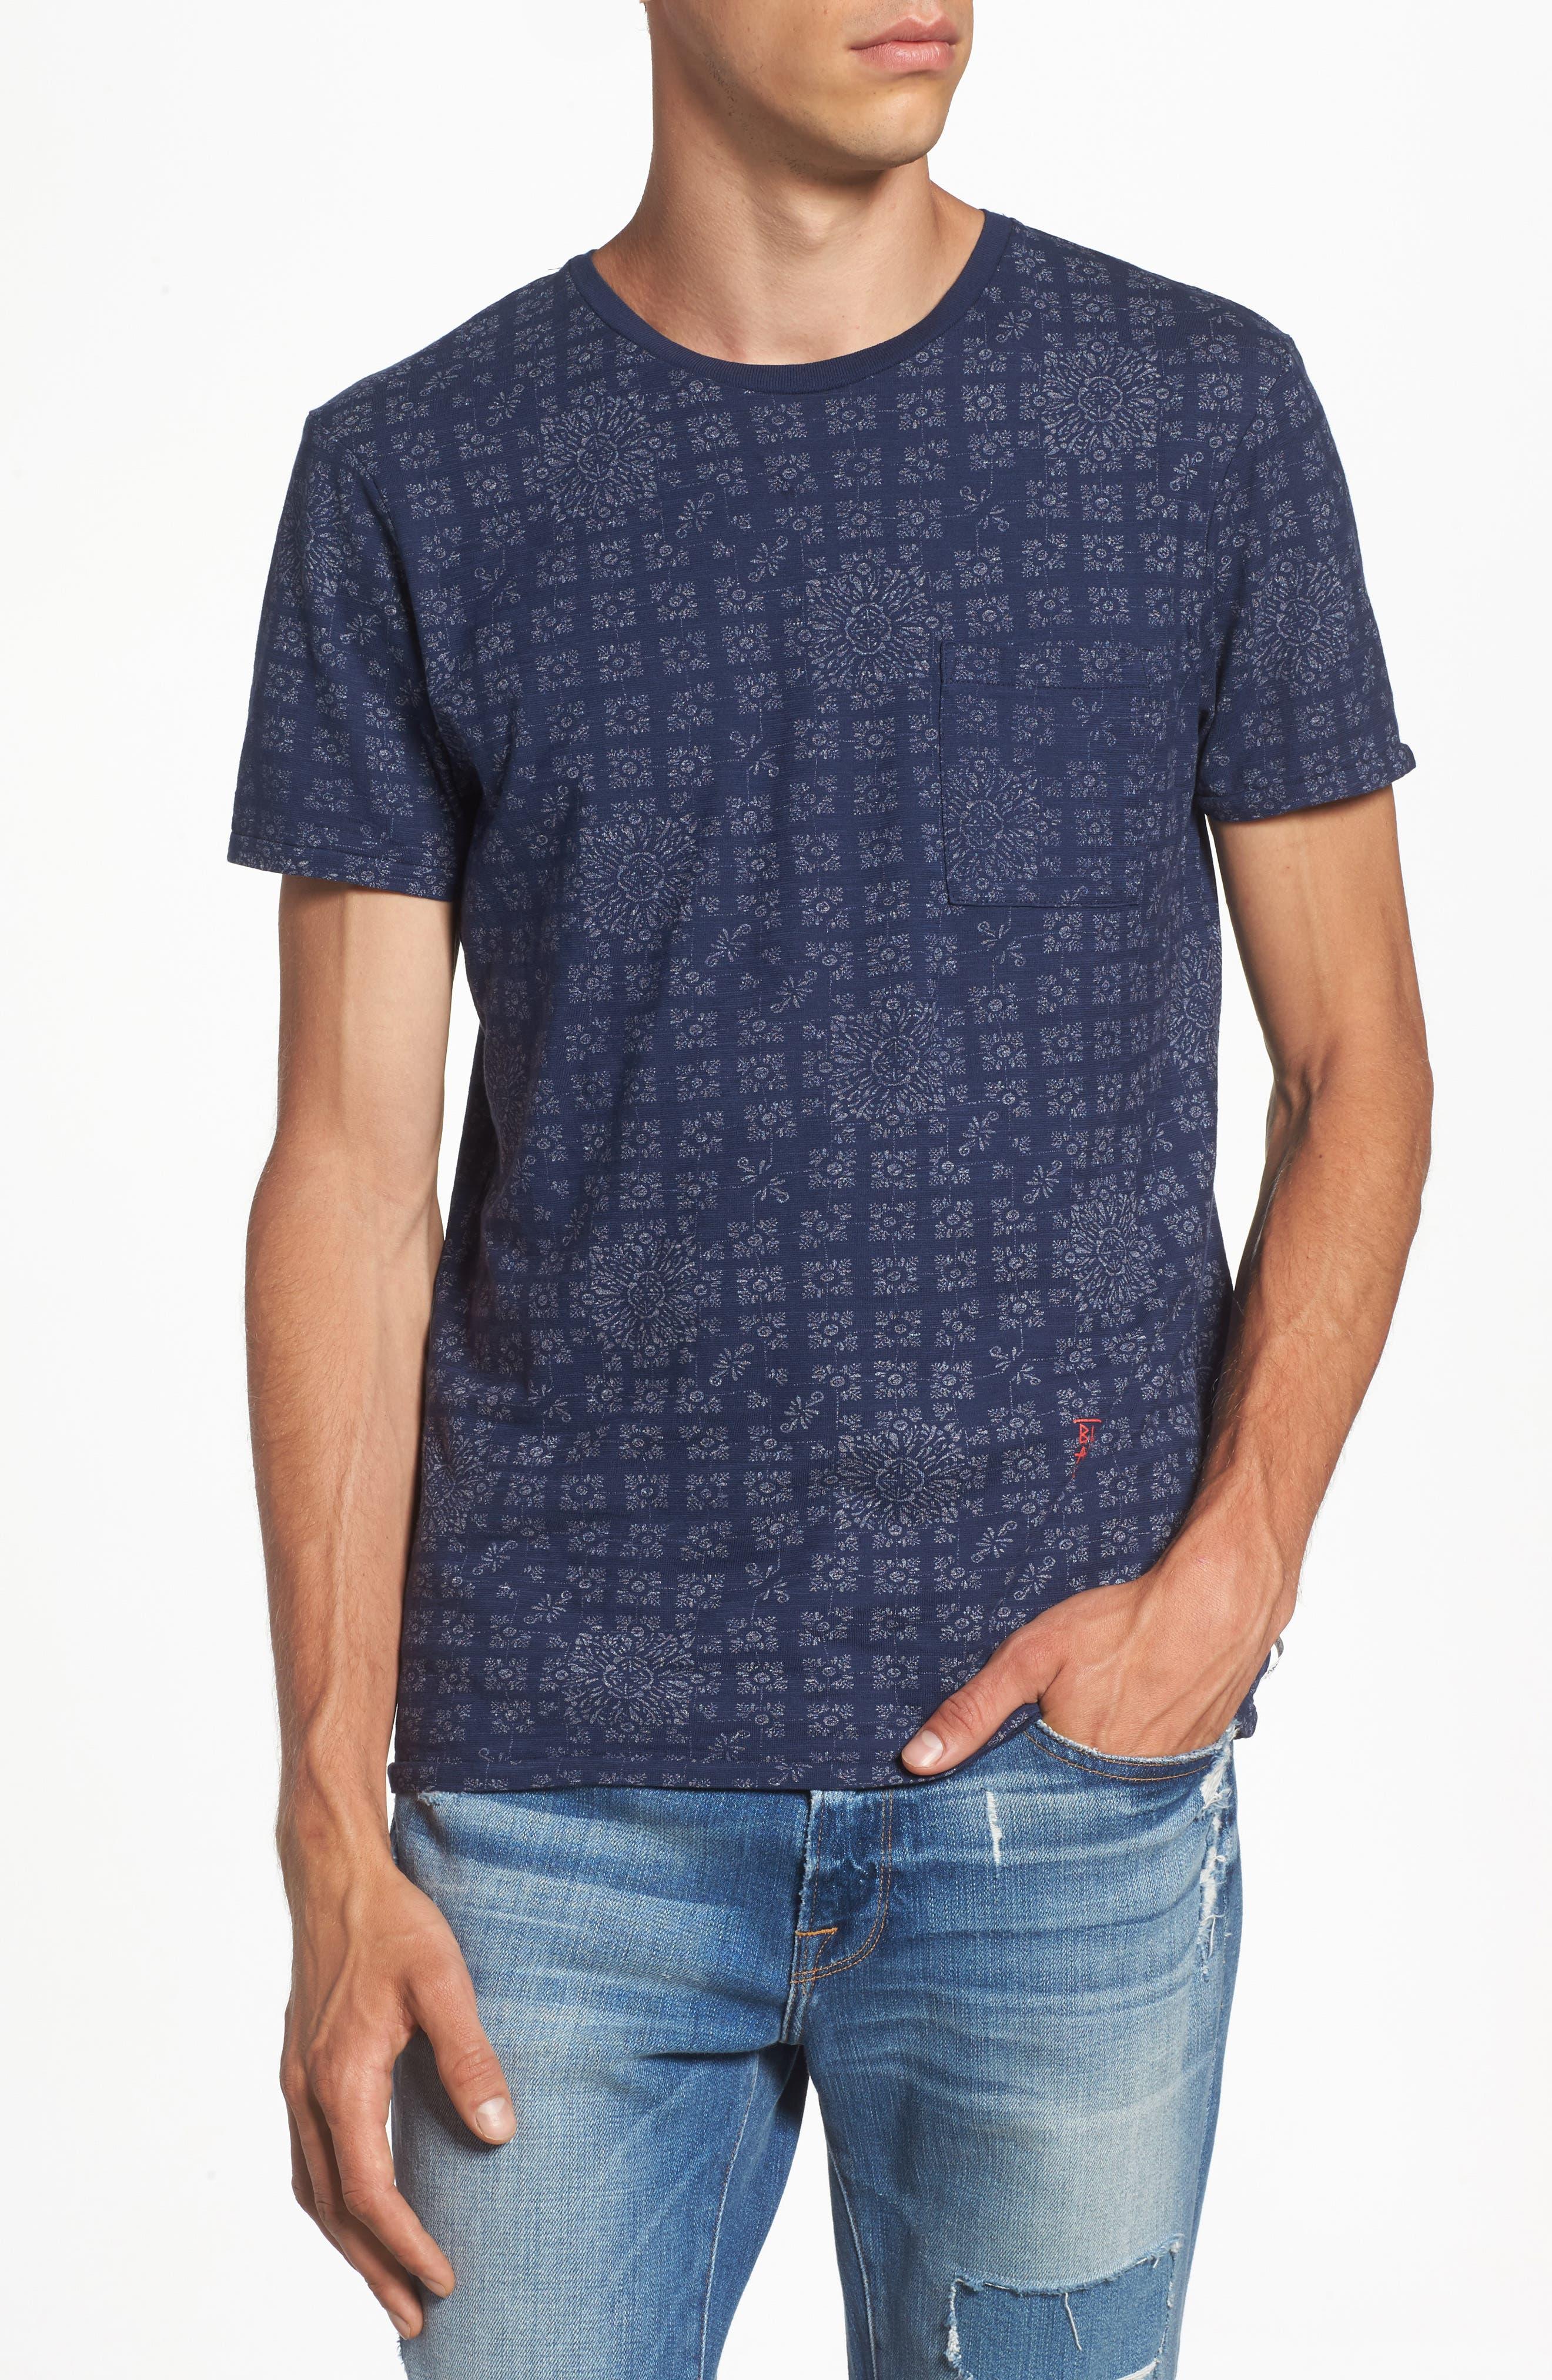 Scotch & Soda AMS Graphic T-Shirt